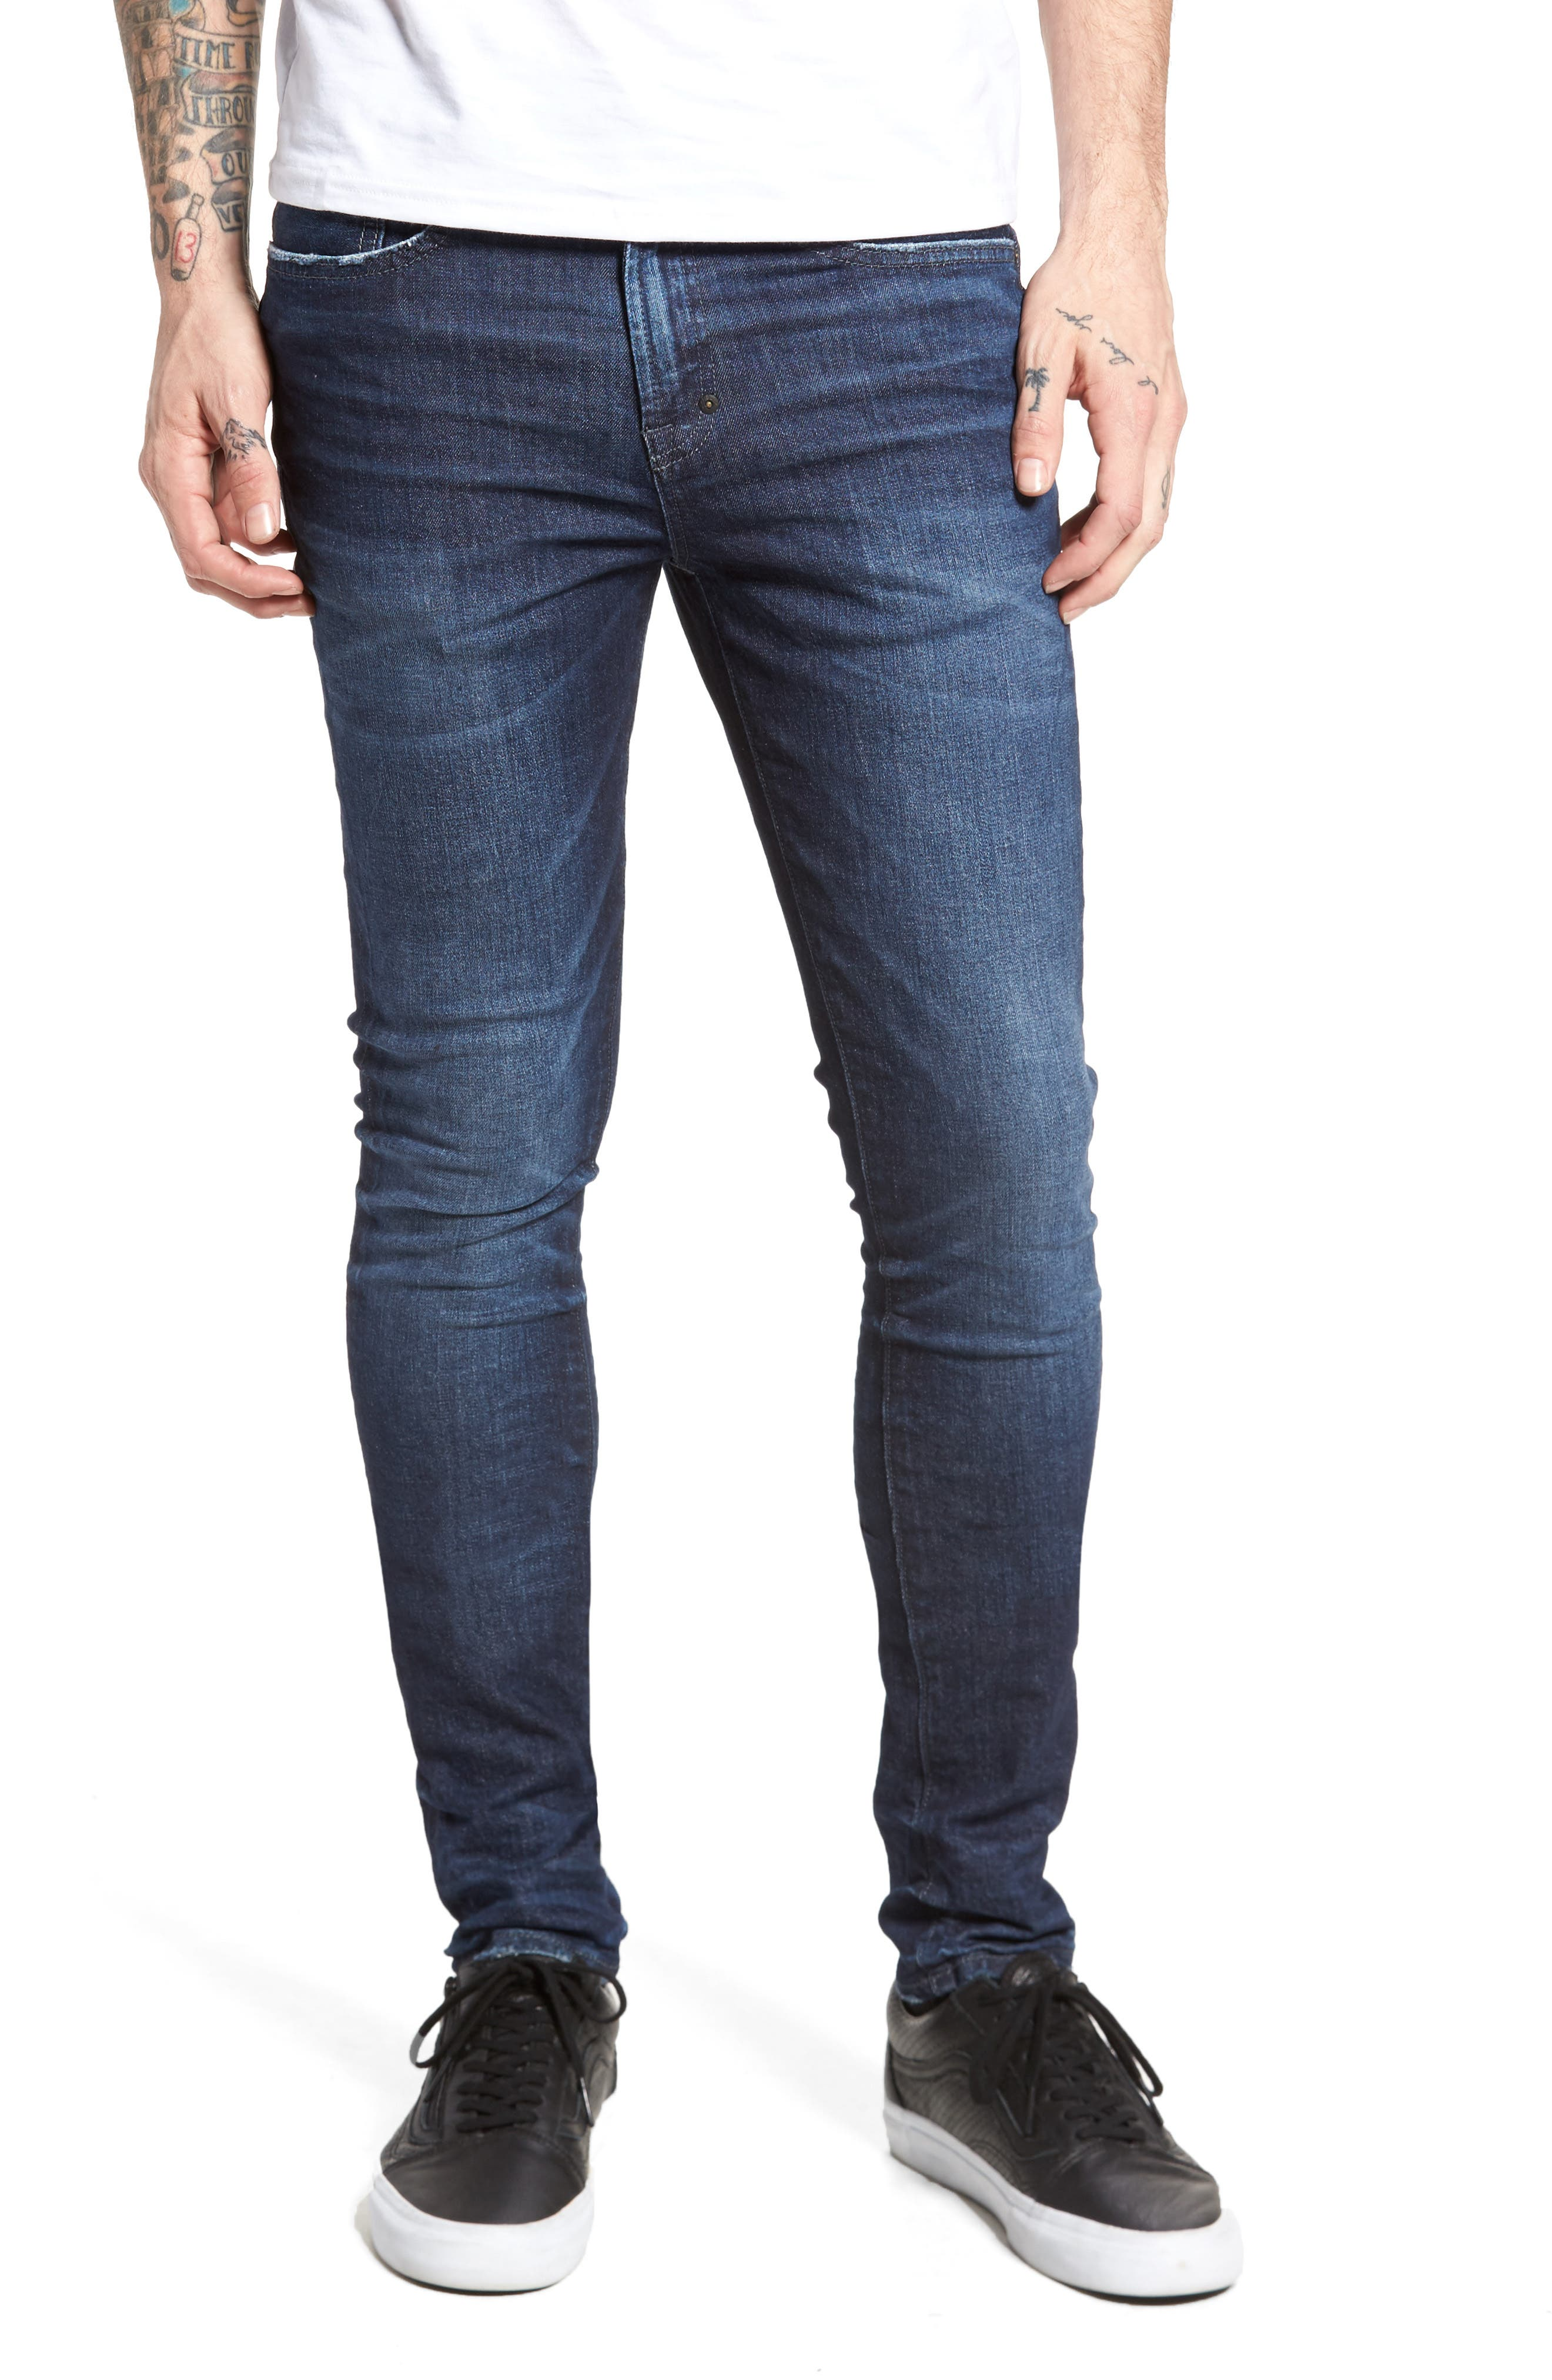 Windsor Slim Fit Jeans,                             Main thumbnail 1, color,                             401